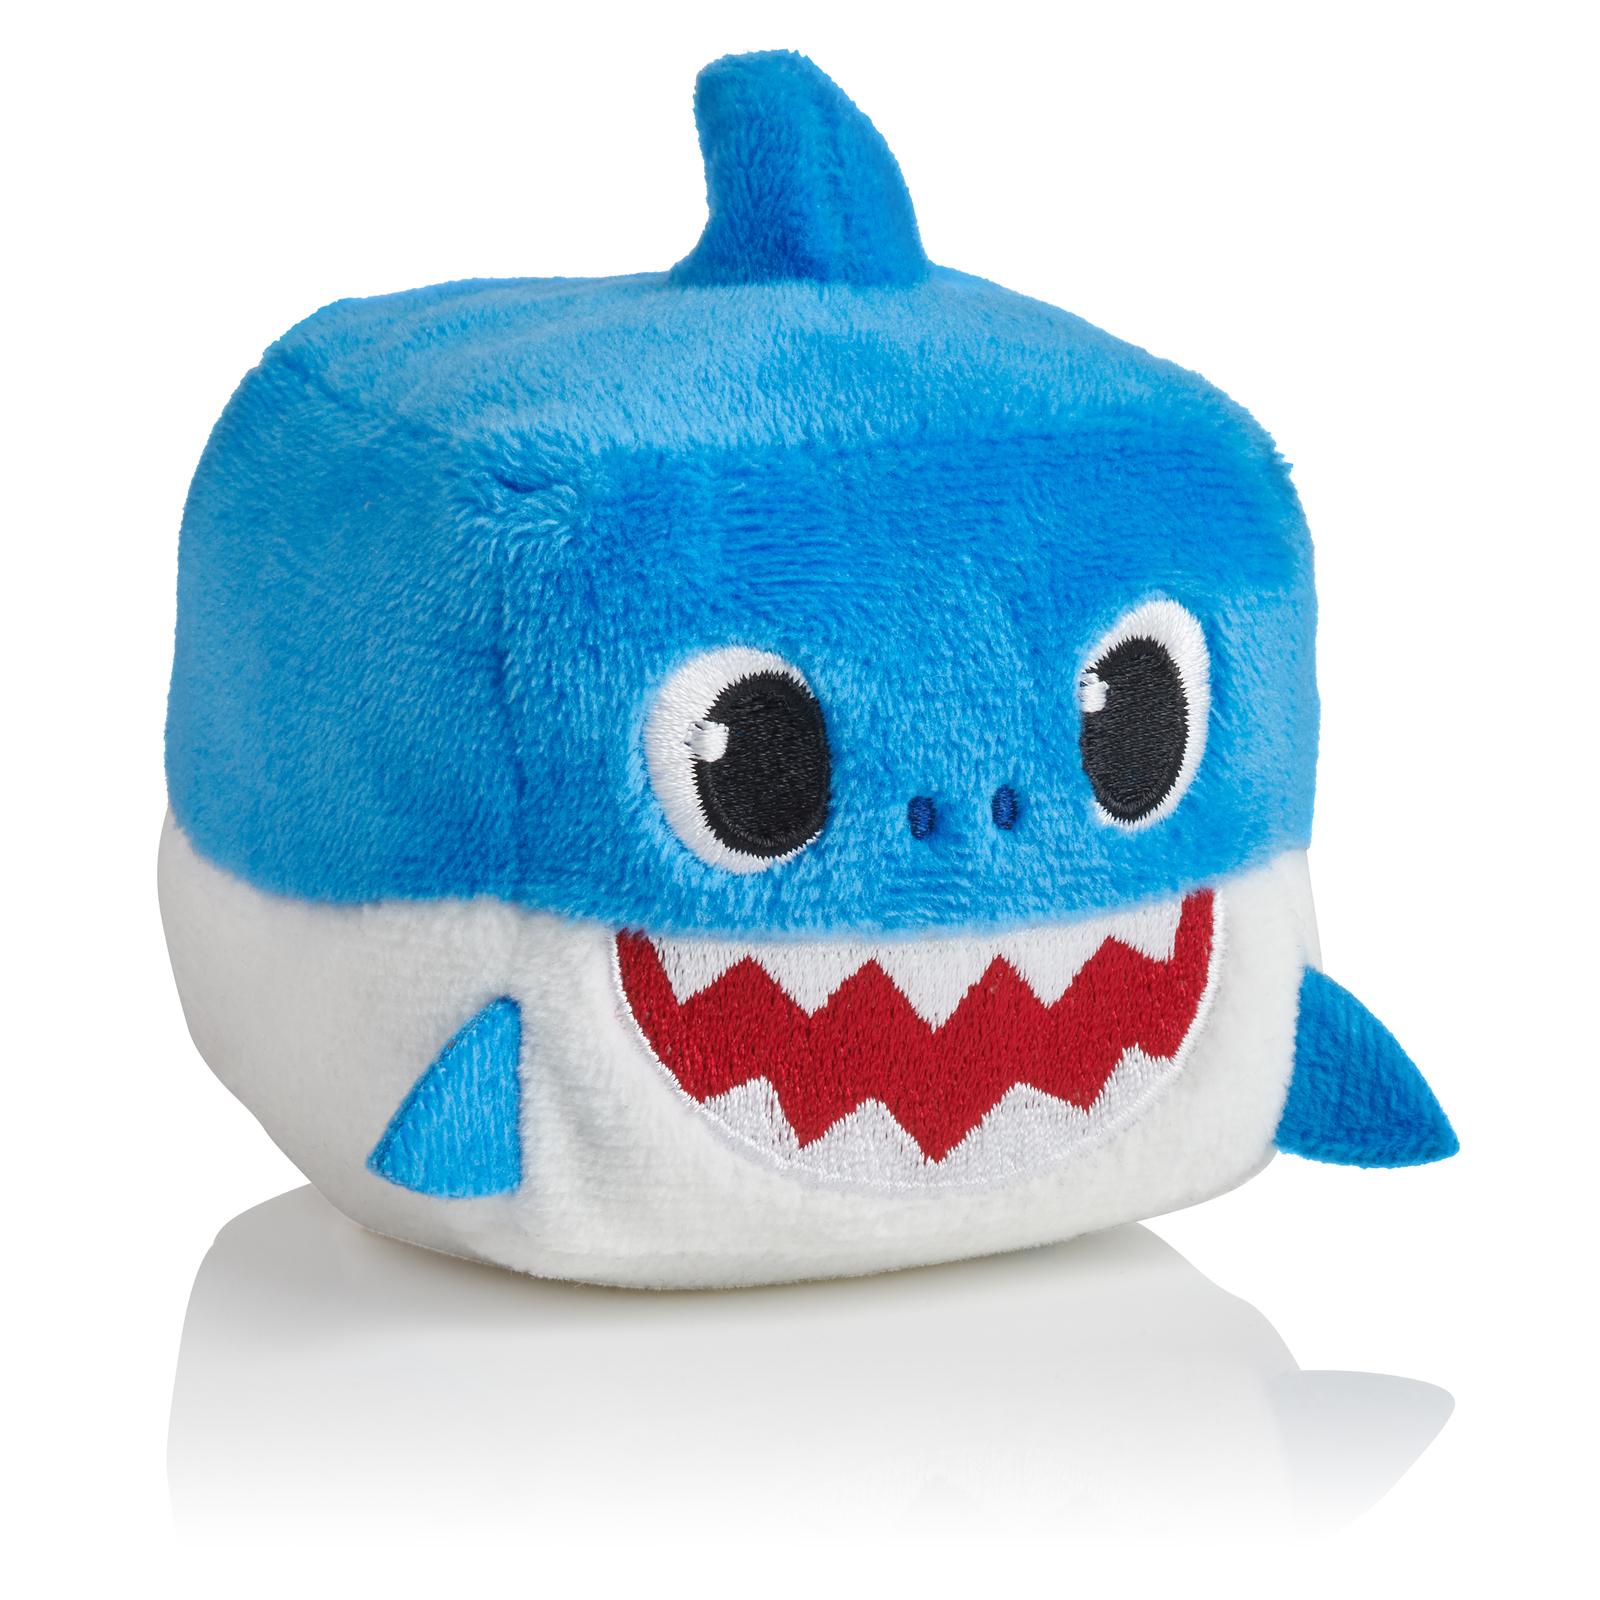 "Daddy Shark - 3"" Sound Cube Plush image"